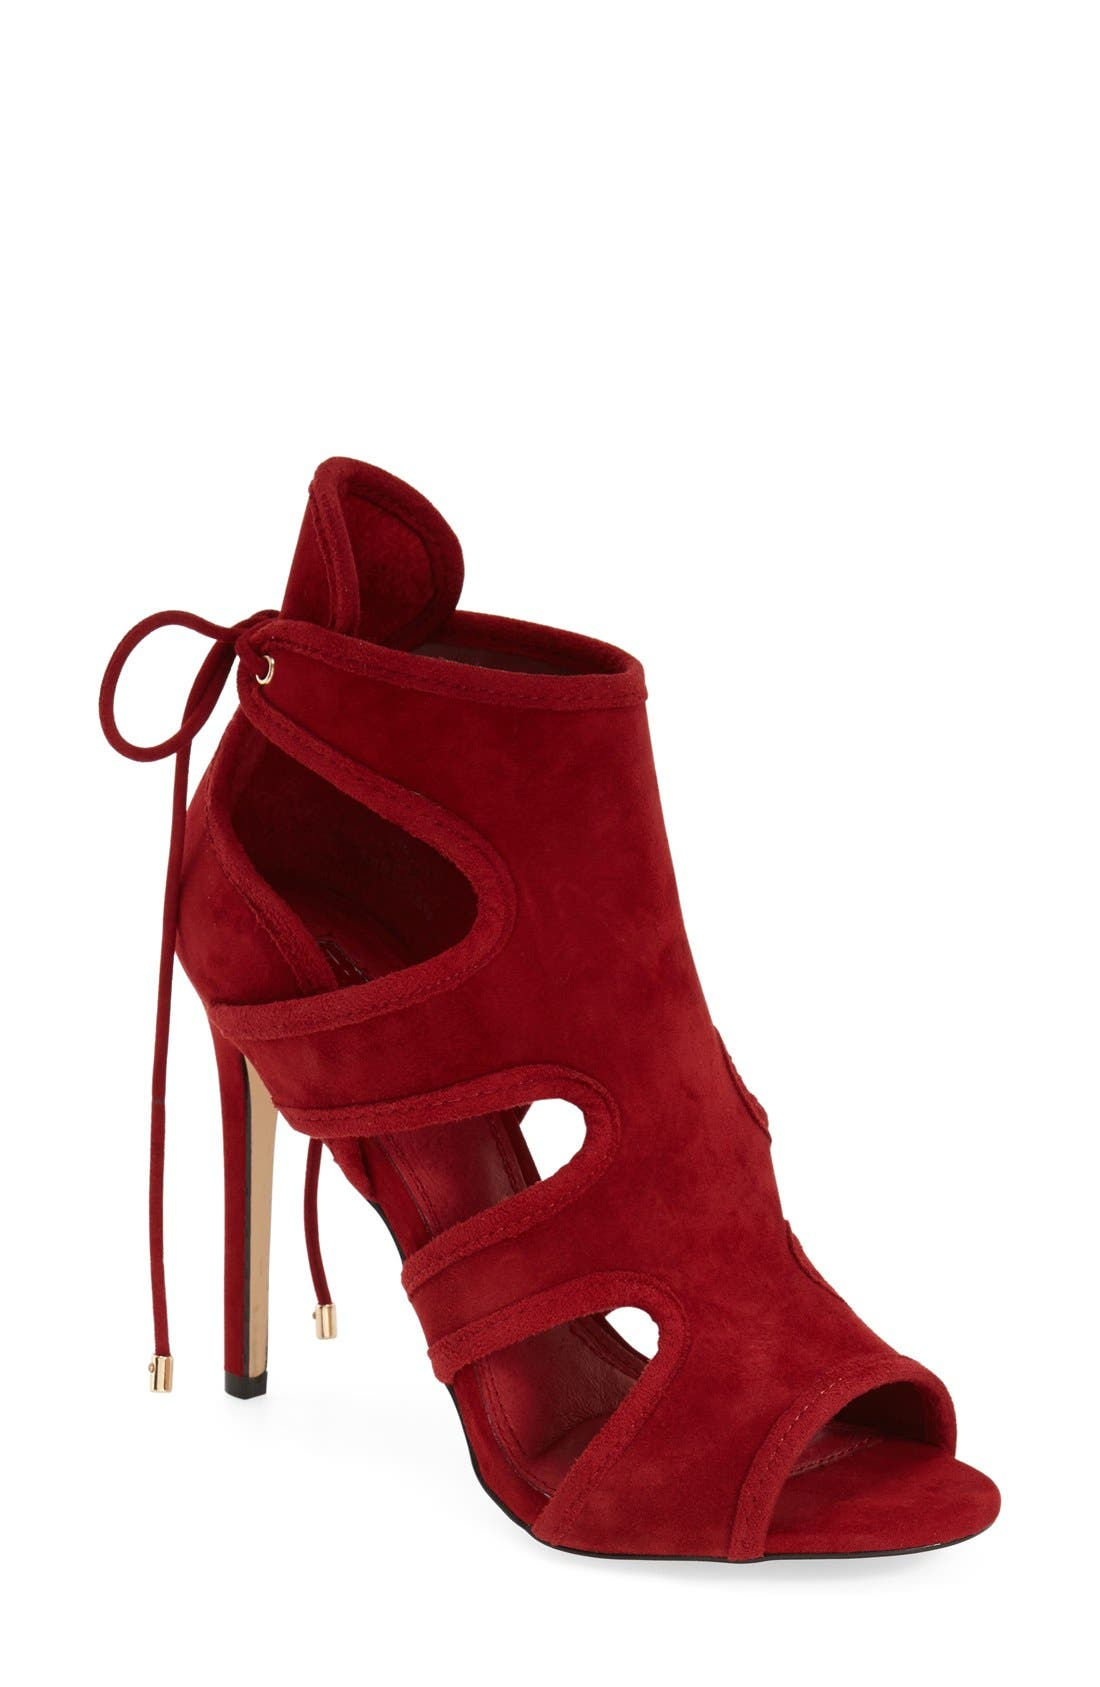 Main Image - Topshop 'Reveal' Cutaway' Sandal (Women)